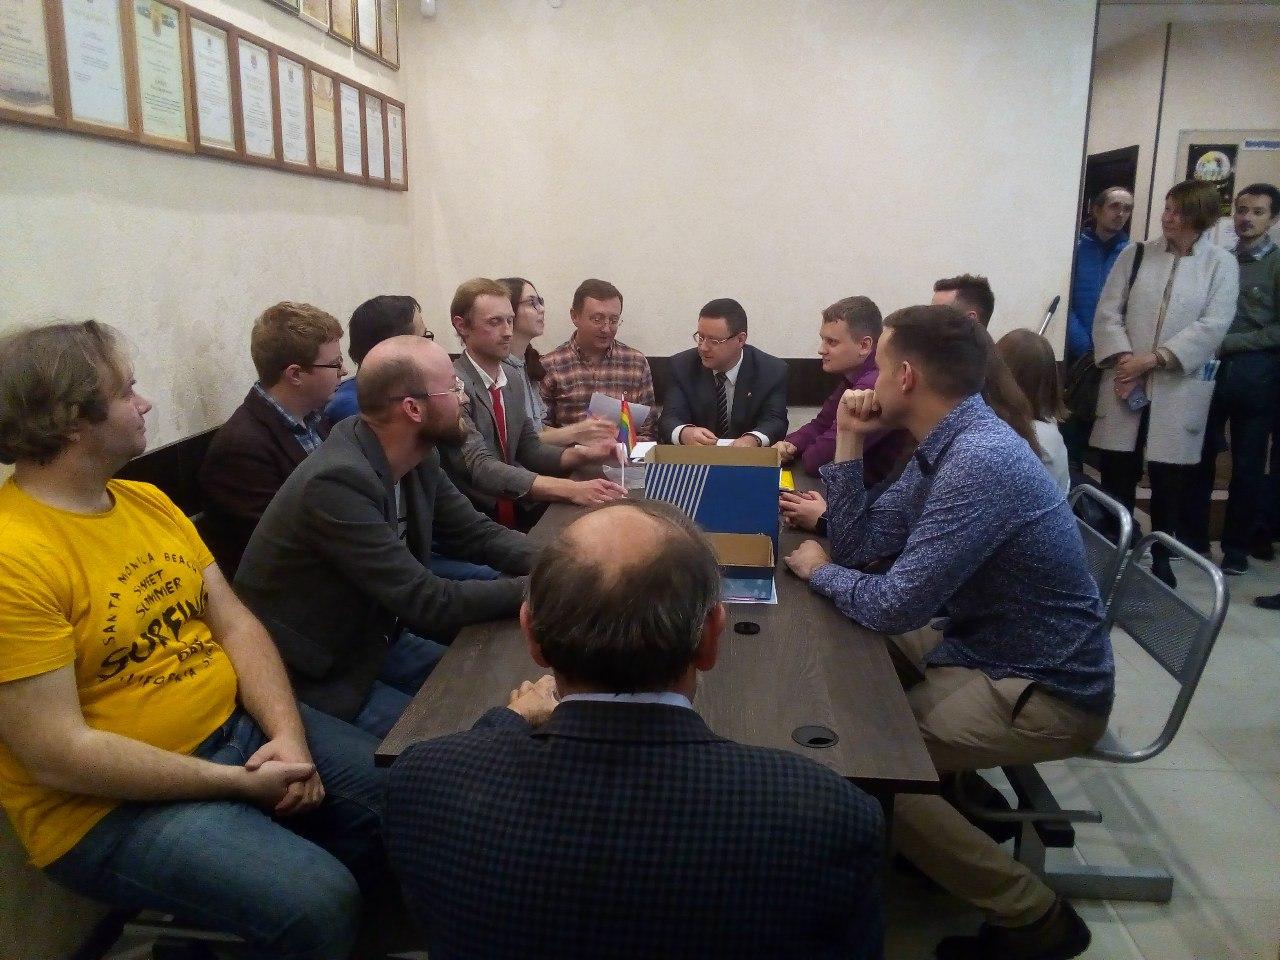 "фото ЗакС политика Глава ""Литейного округа"" не пустил 12 депутатов от ""Яблока"" в зал заседаний"